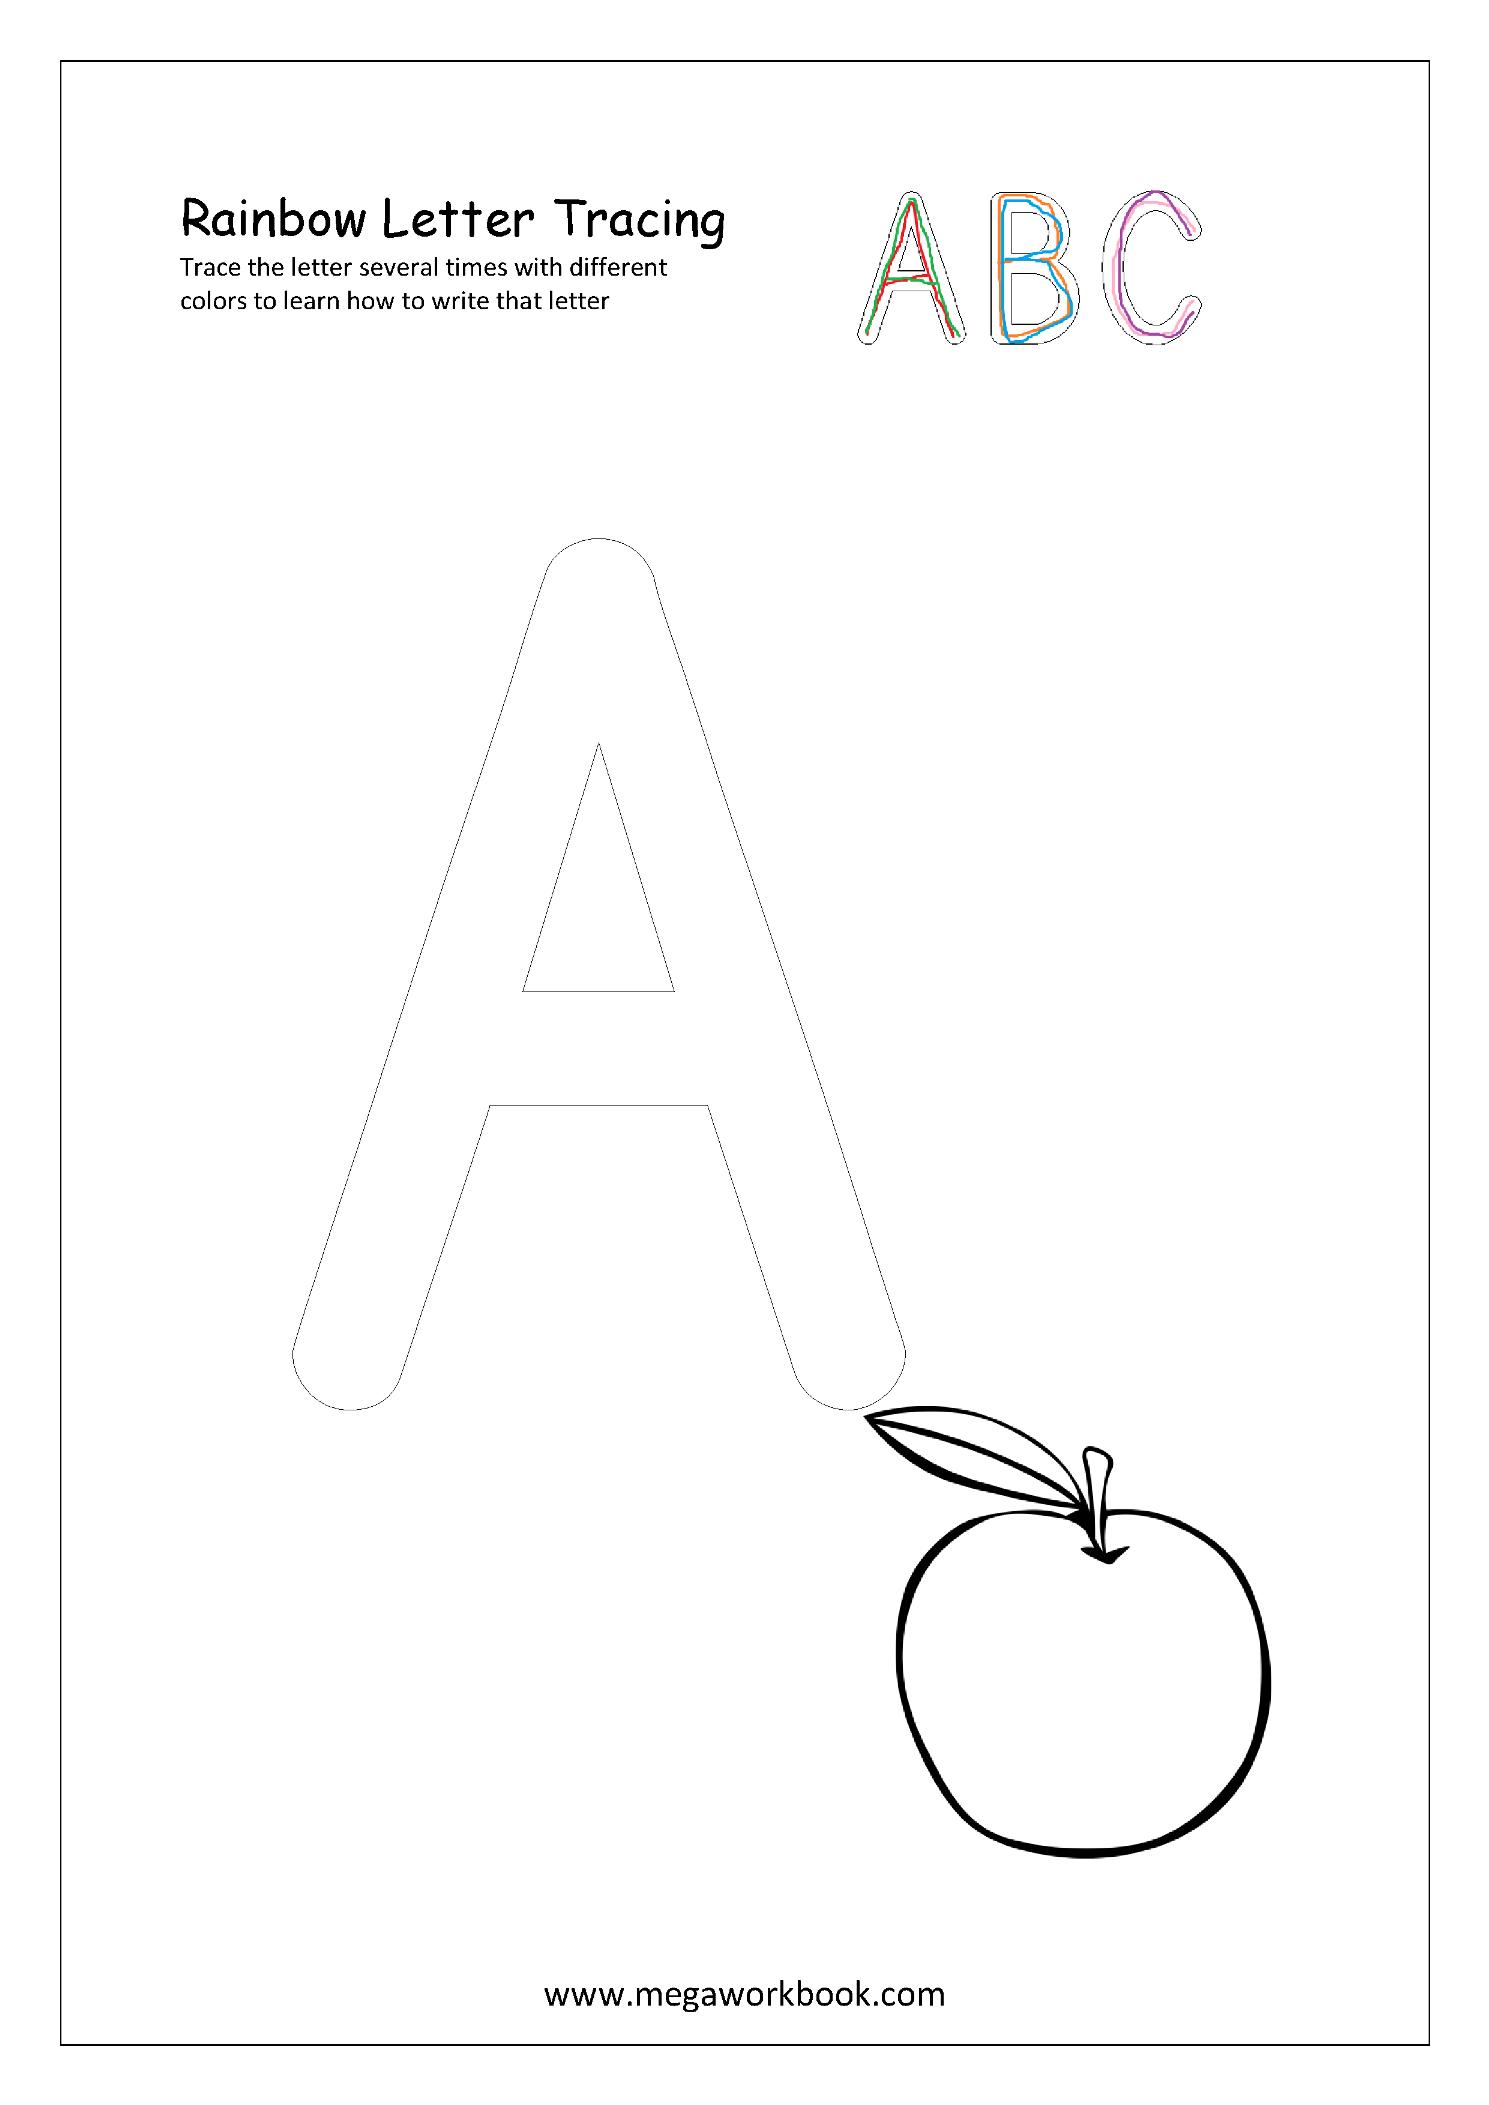 Free Printable Rainbow Writing Worksheets - Rainbow Letter Tracing - Free Printable Rainbow Letters